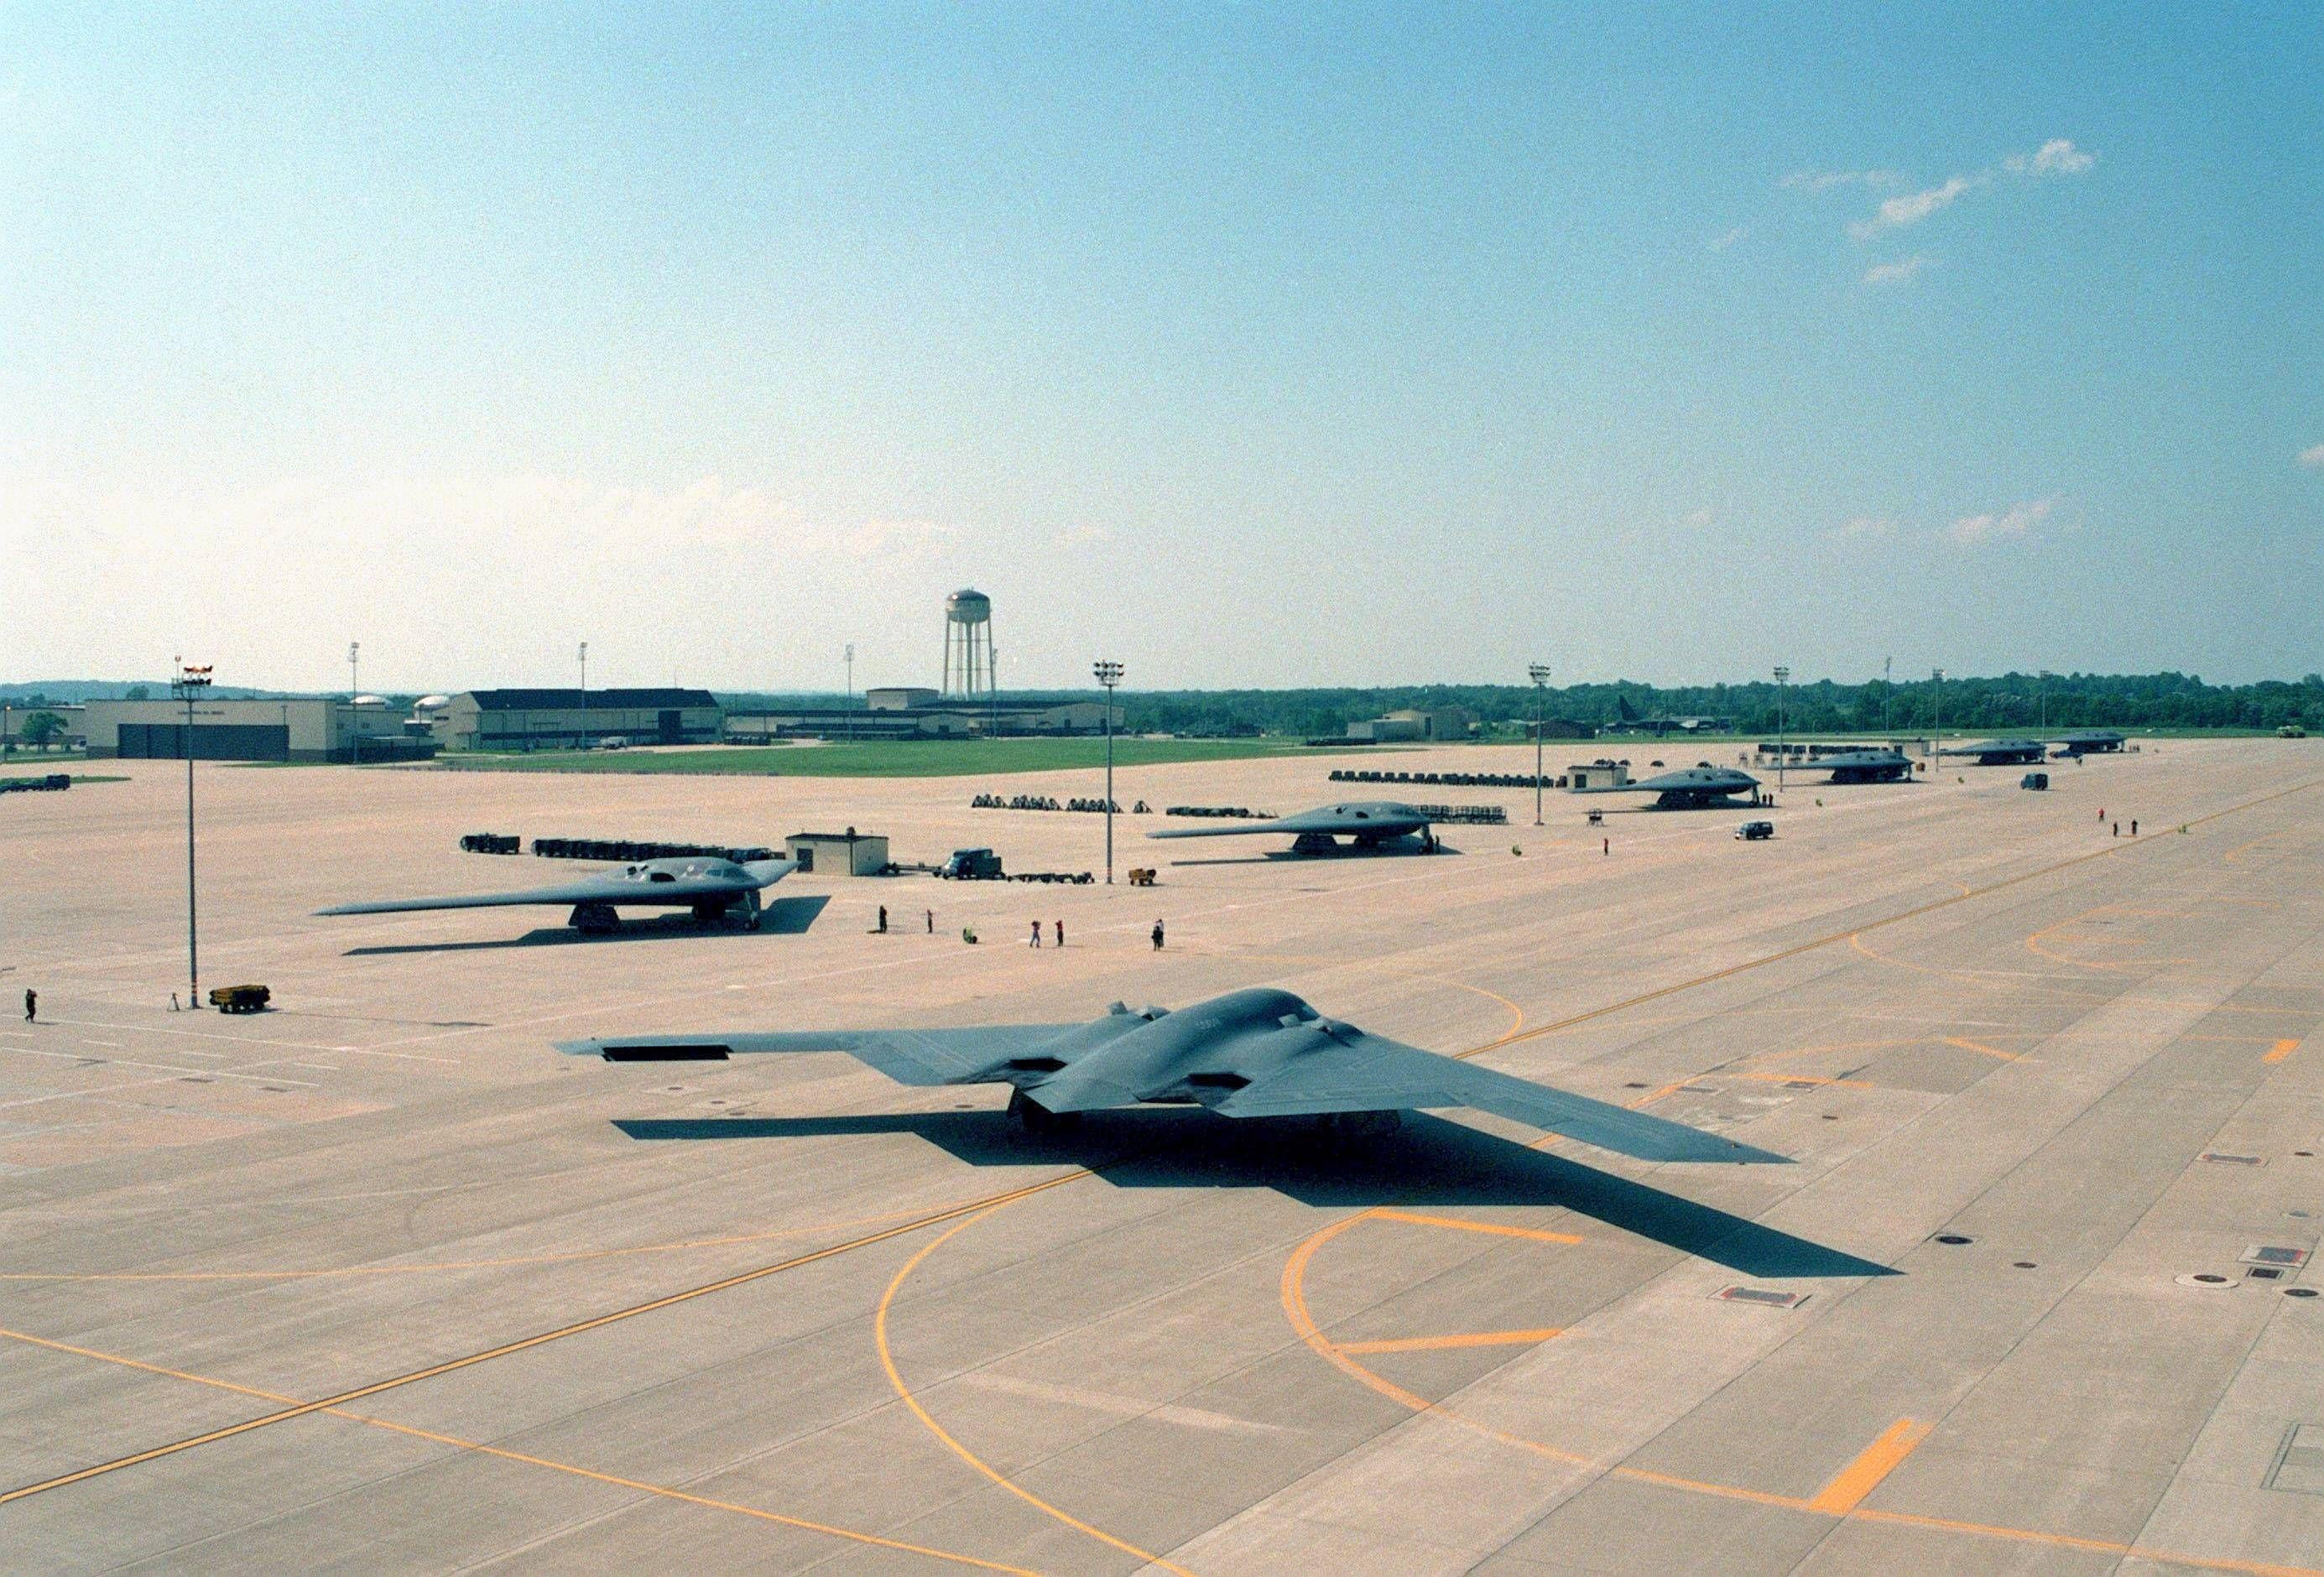 Seven U.S. Air Force B2 Spirit stealth bombers